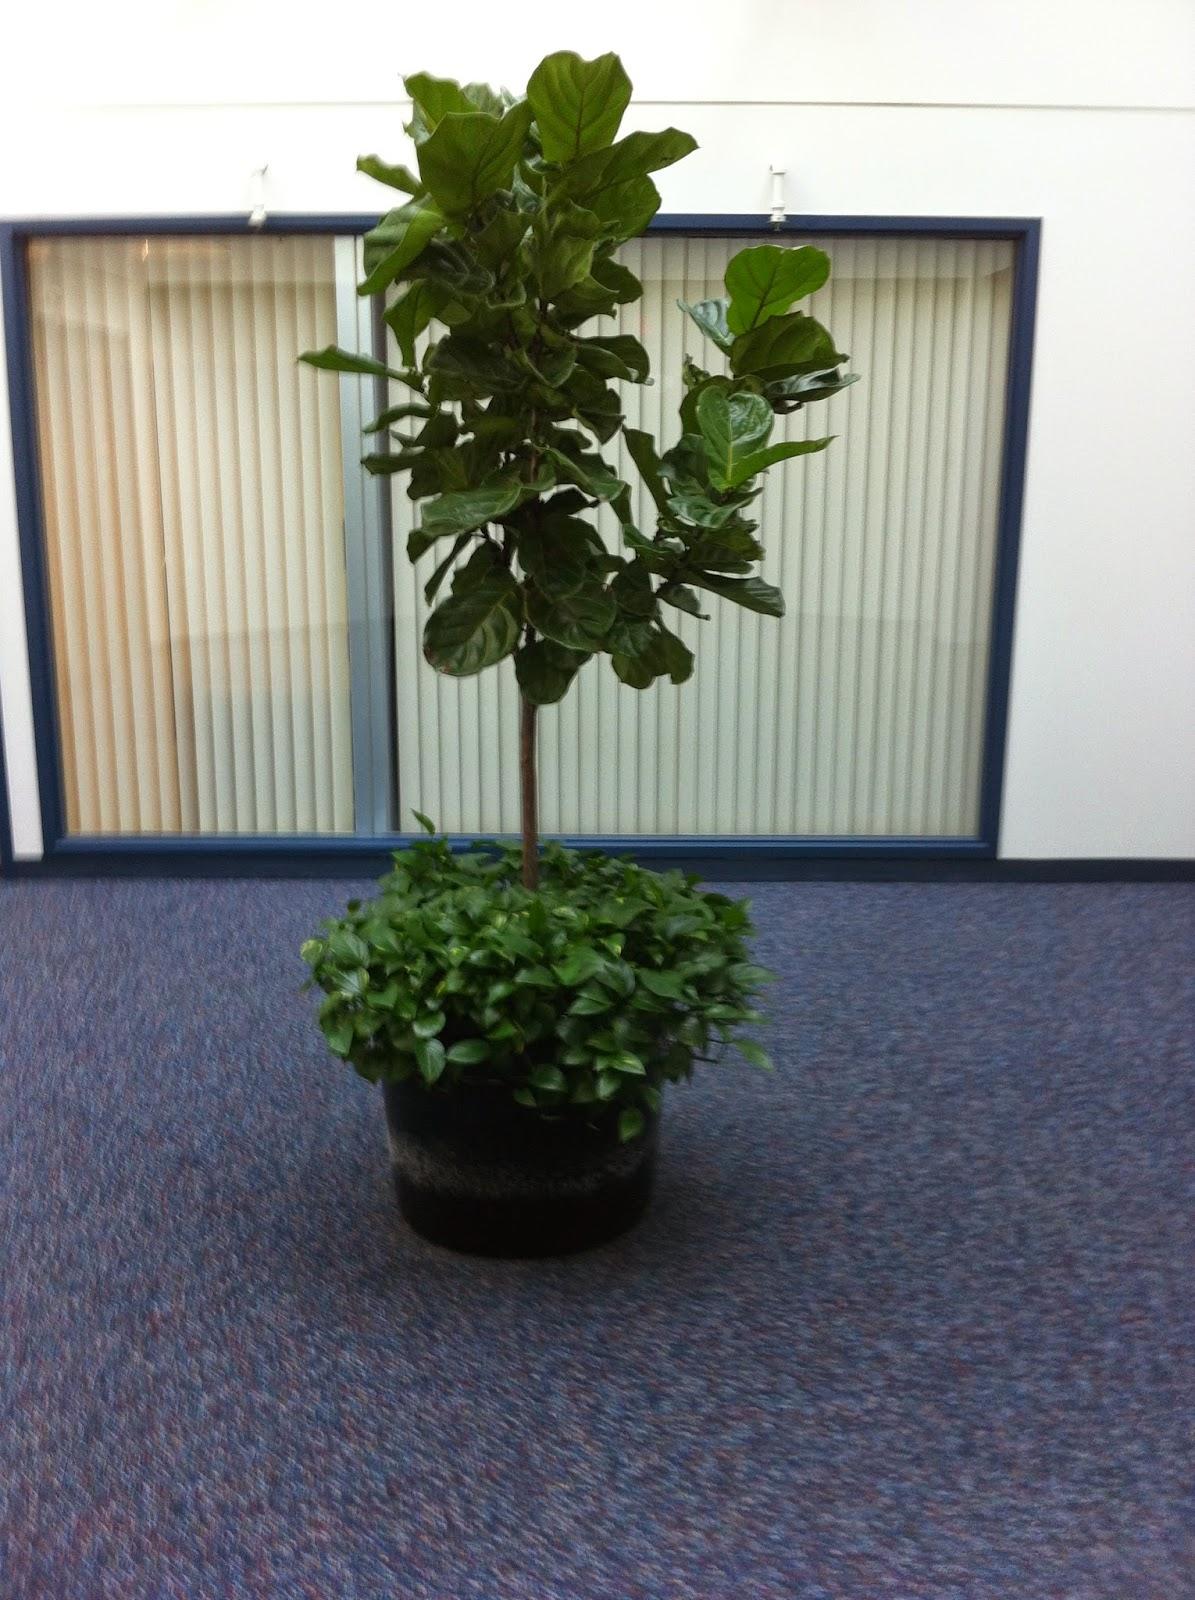 PDI Plants Blog: Plantscape Designs Inc. plants live underdressing ...